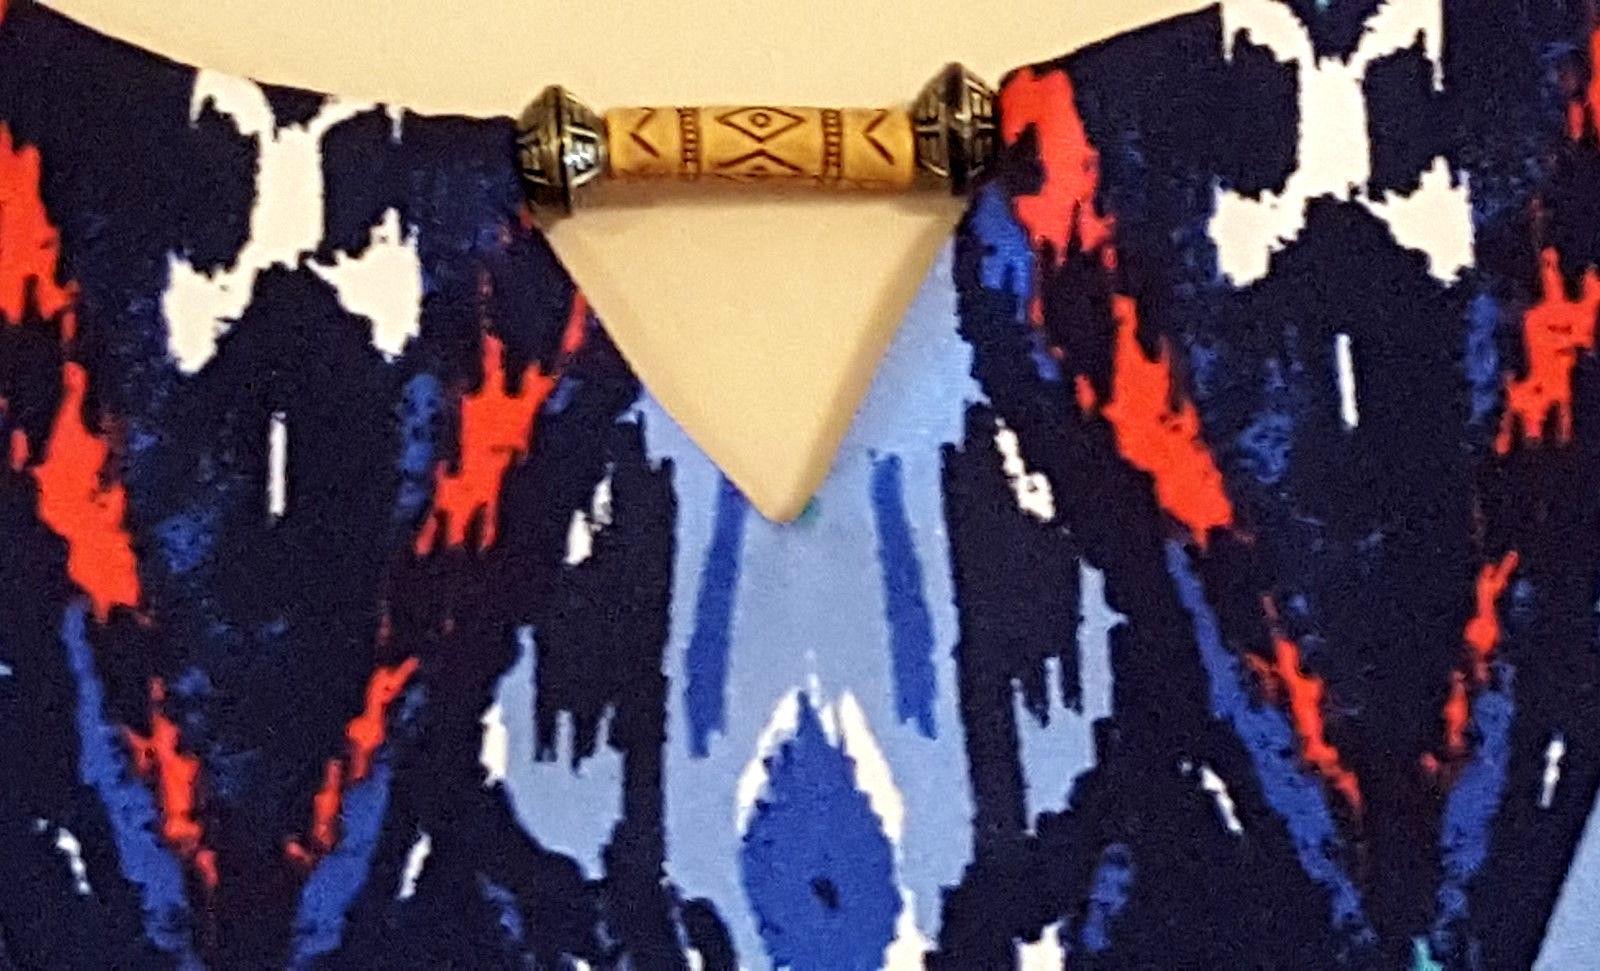 NEW DIRECTIONS RN 31104 – Women's Blue/Coral Sleeveless Dress – Size:  MEDIUM